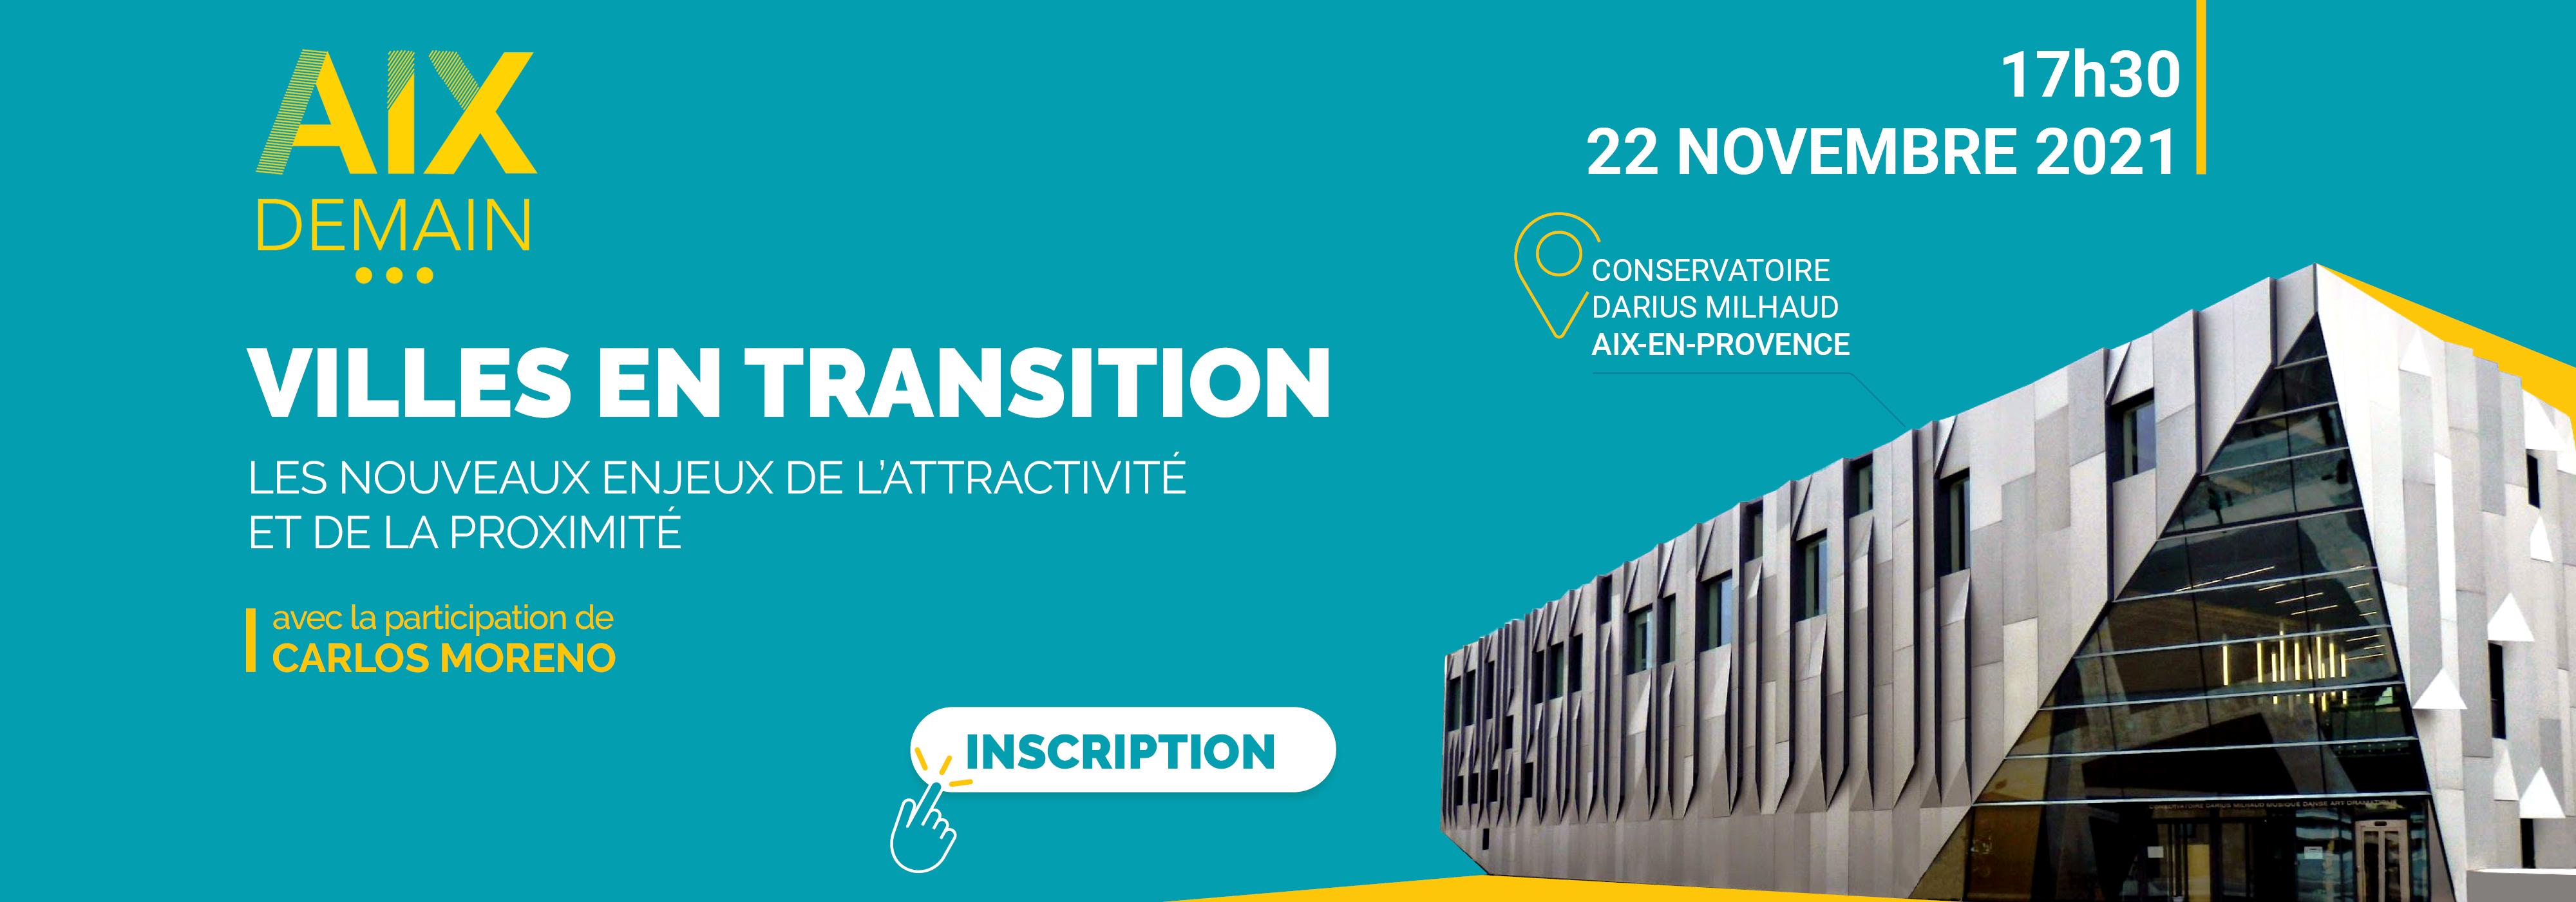 "Séminaire ""Aix Demain"", le 22 novembre 2021"